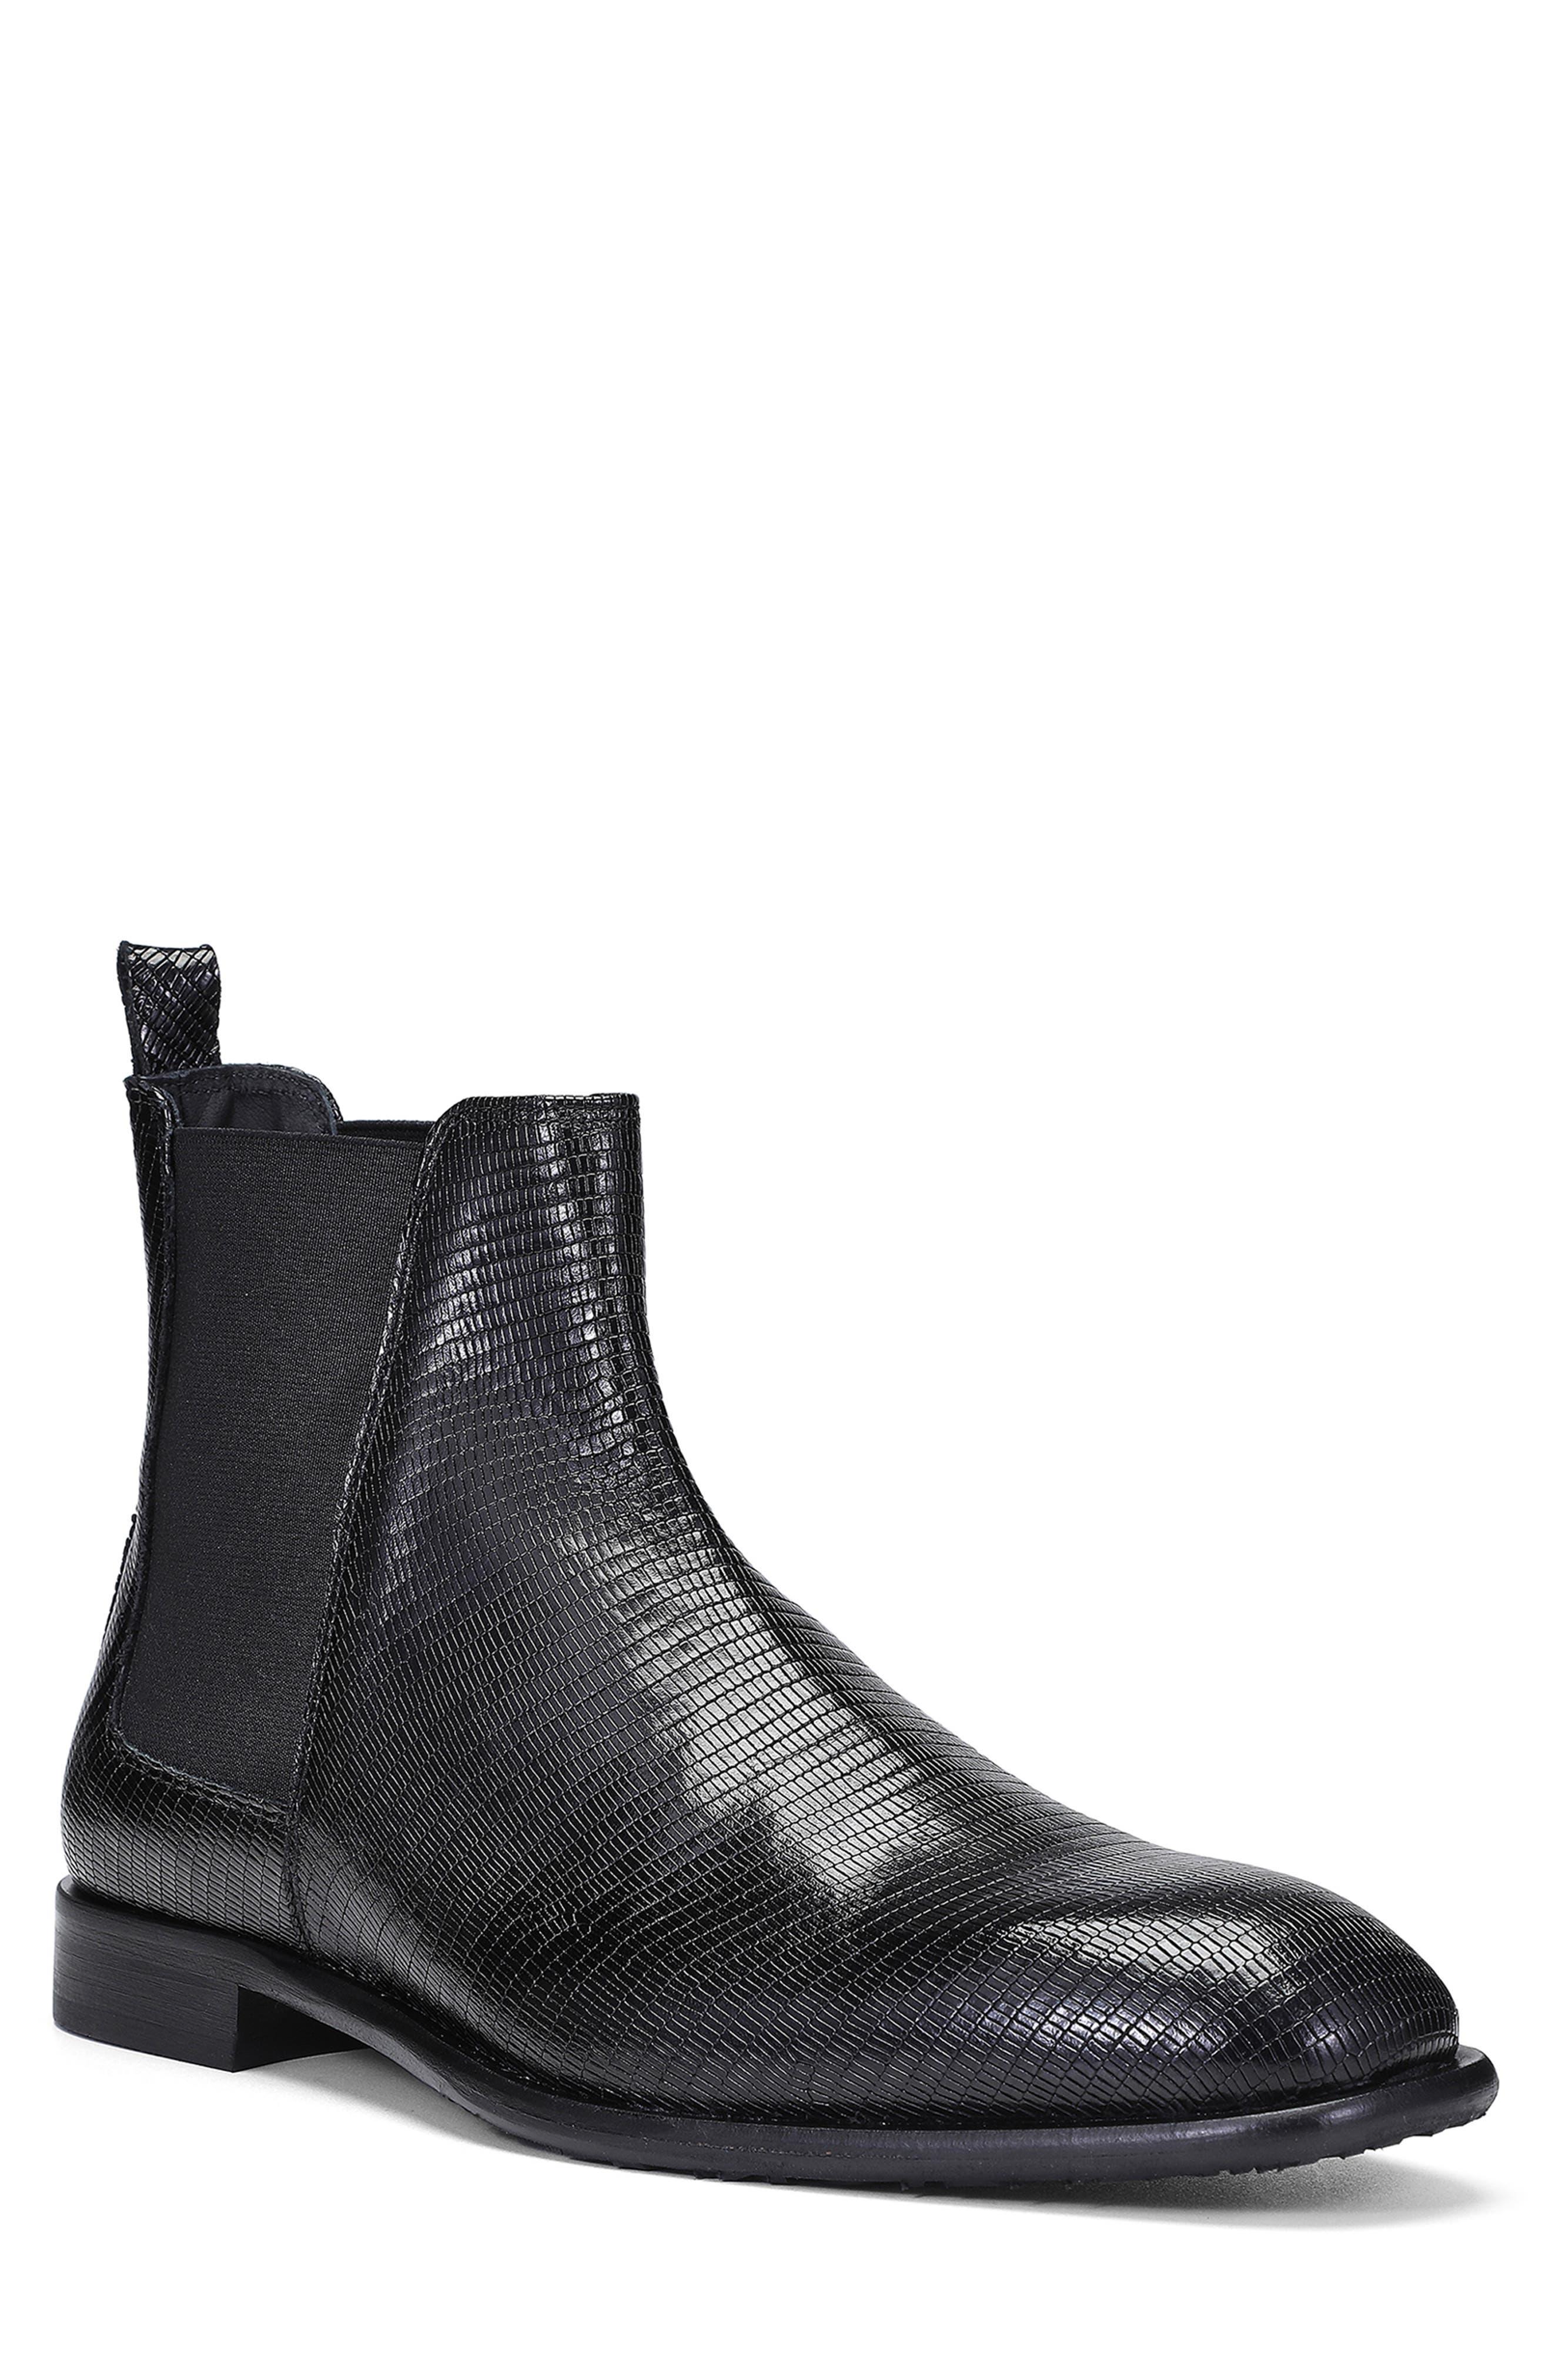 Roscoe Chelsea Boot